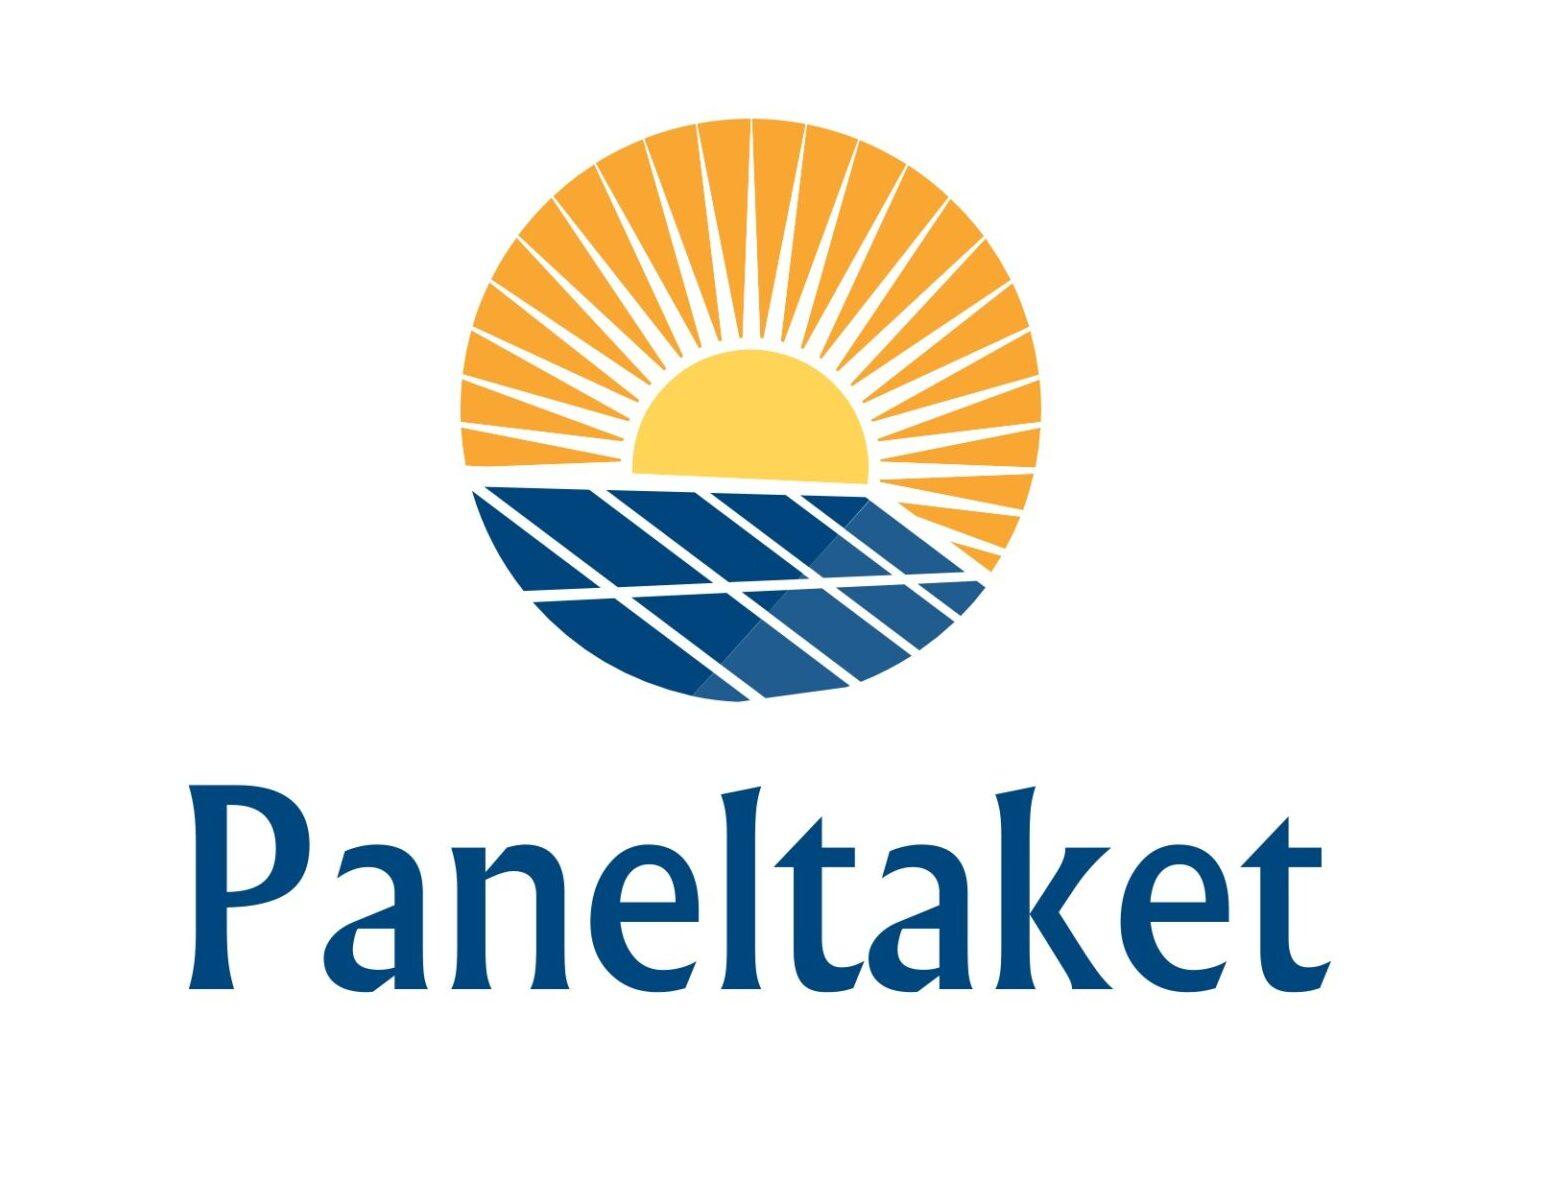 Paneltaket